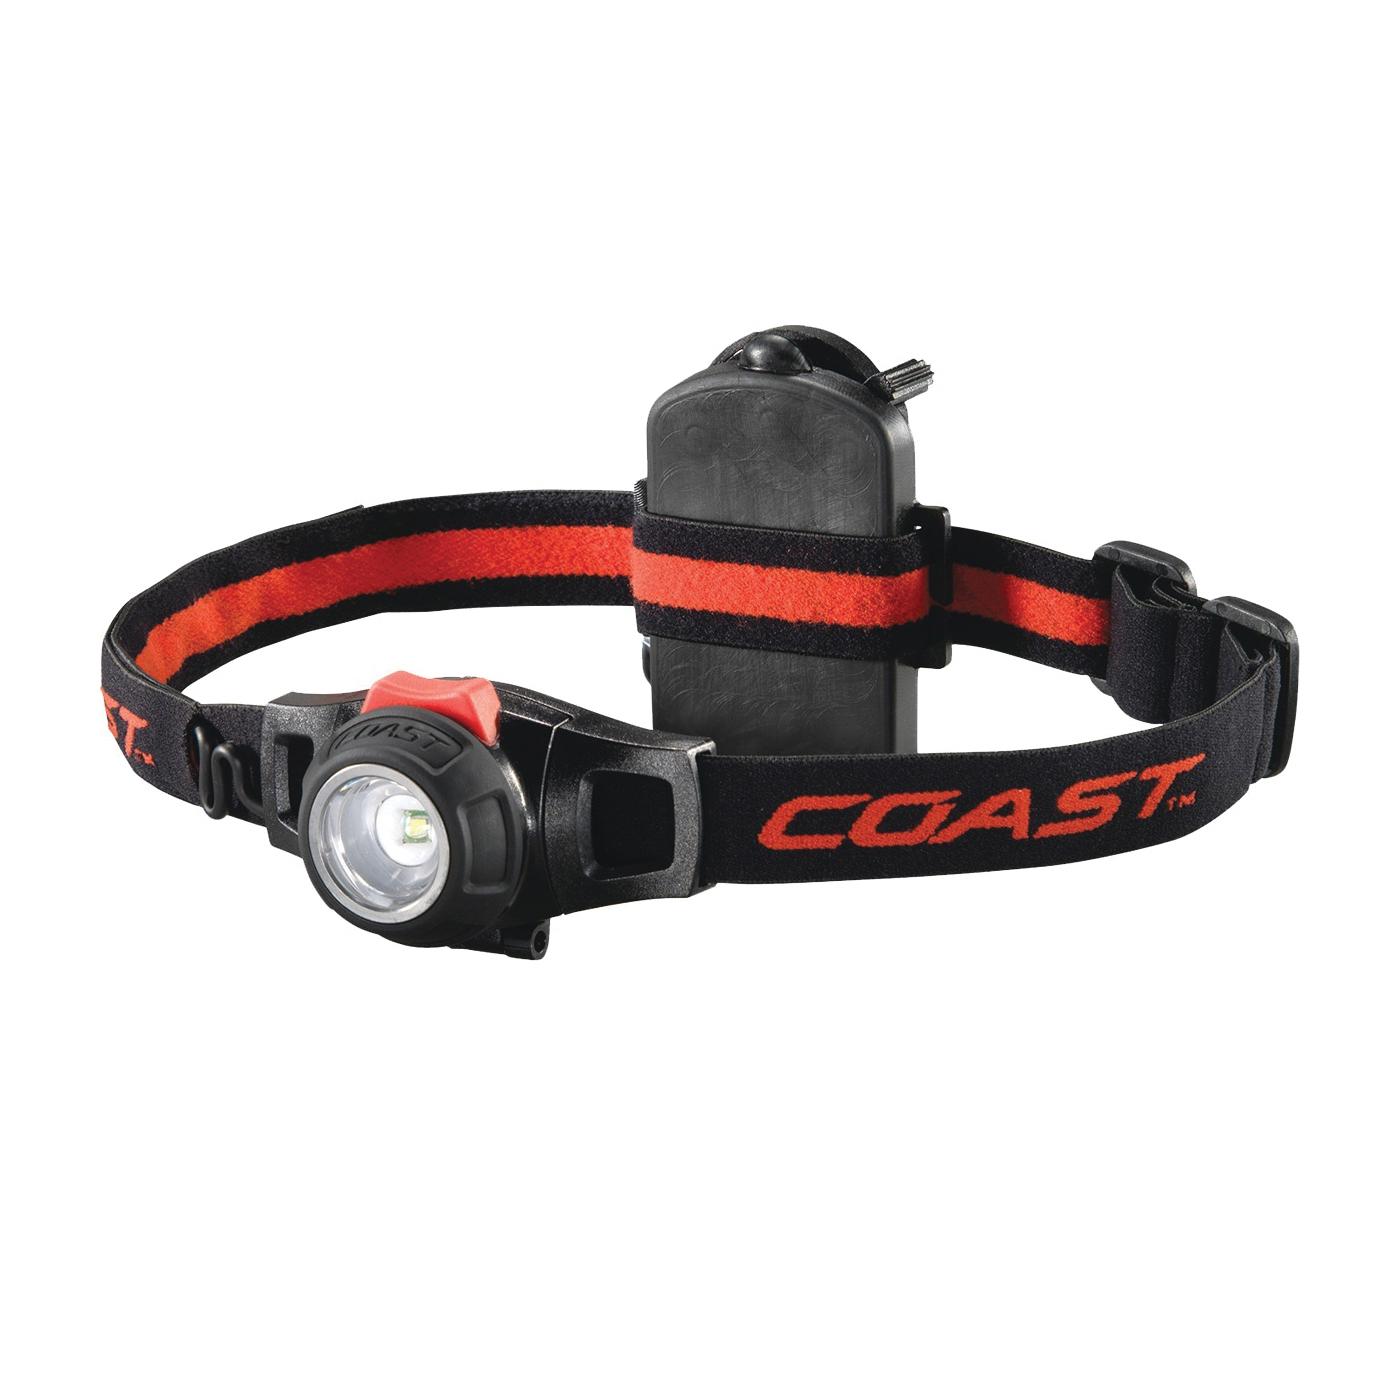 Picture of Coast 19284 Adjustable Headlamp, AAA Battery, LED Lamp, 305 Lumens, Bulls-Eye Spot Beam, Black